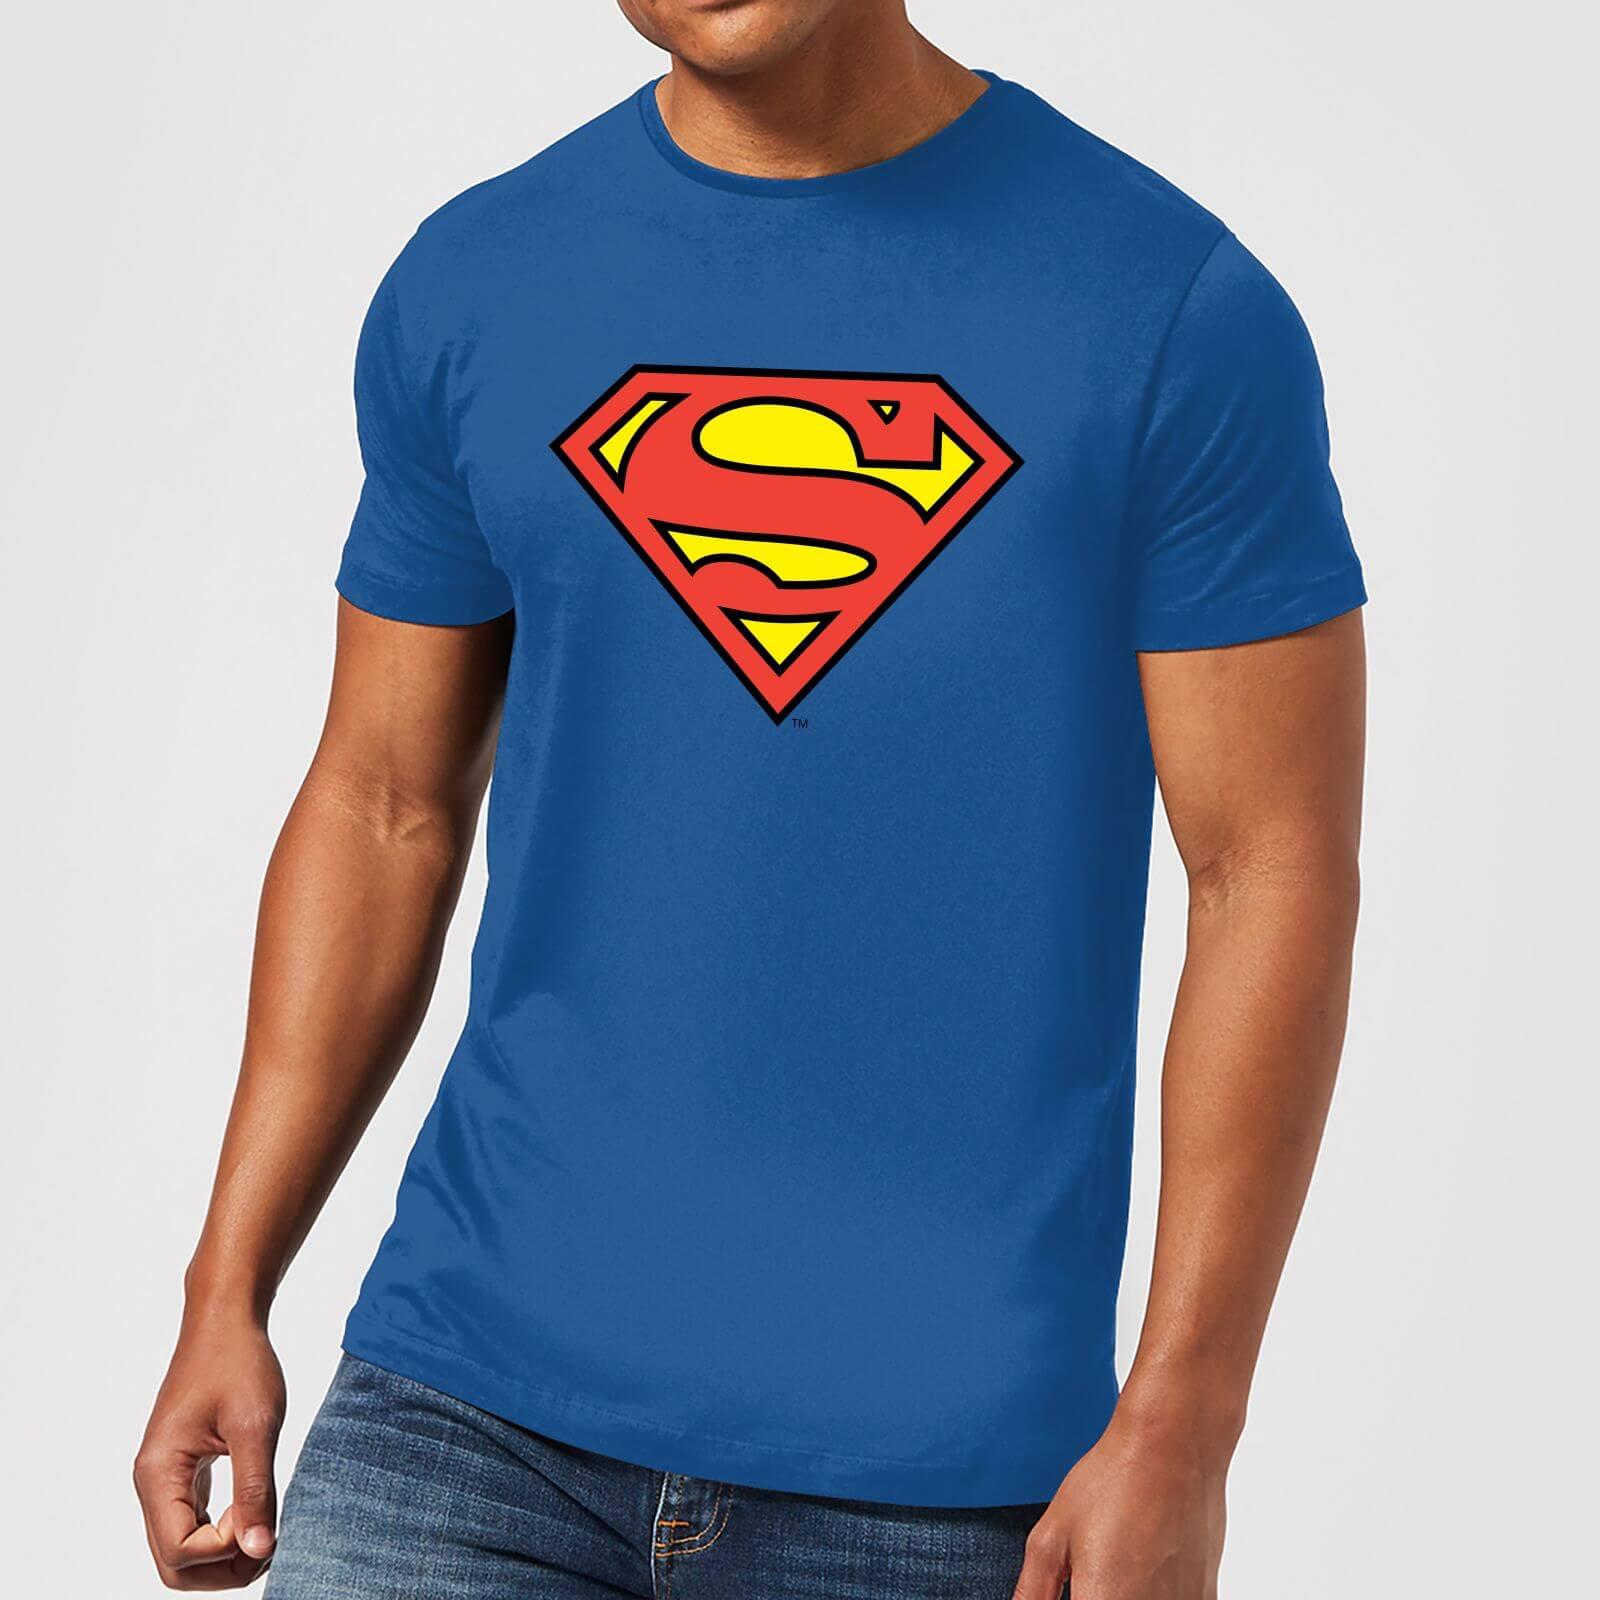 f329d94226 Camiseta DC Comics Superman Logo Clásico - Hombre - Azul Clothing   Zavvi  España